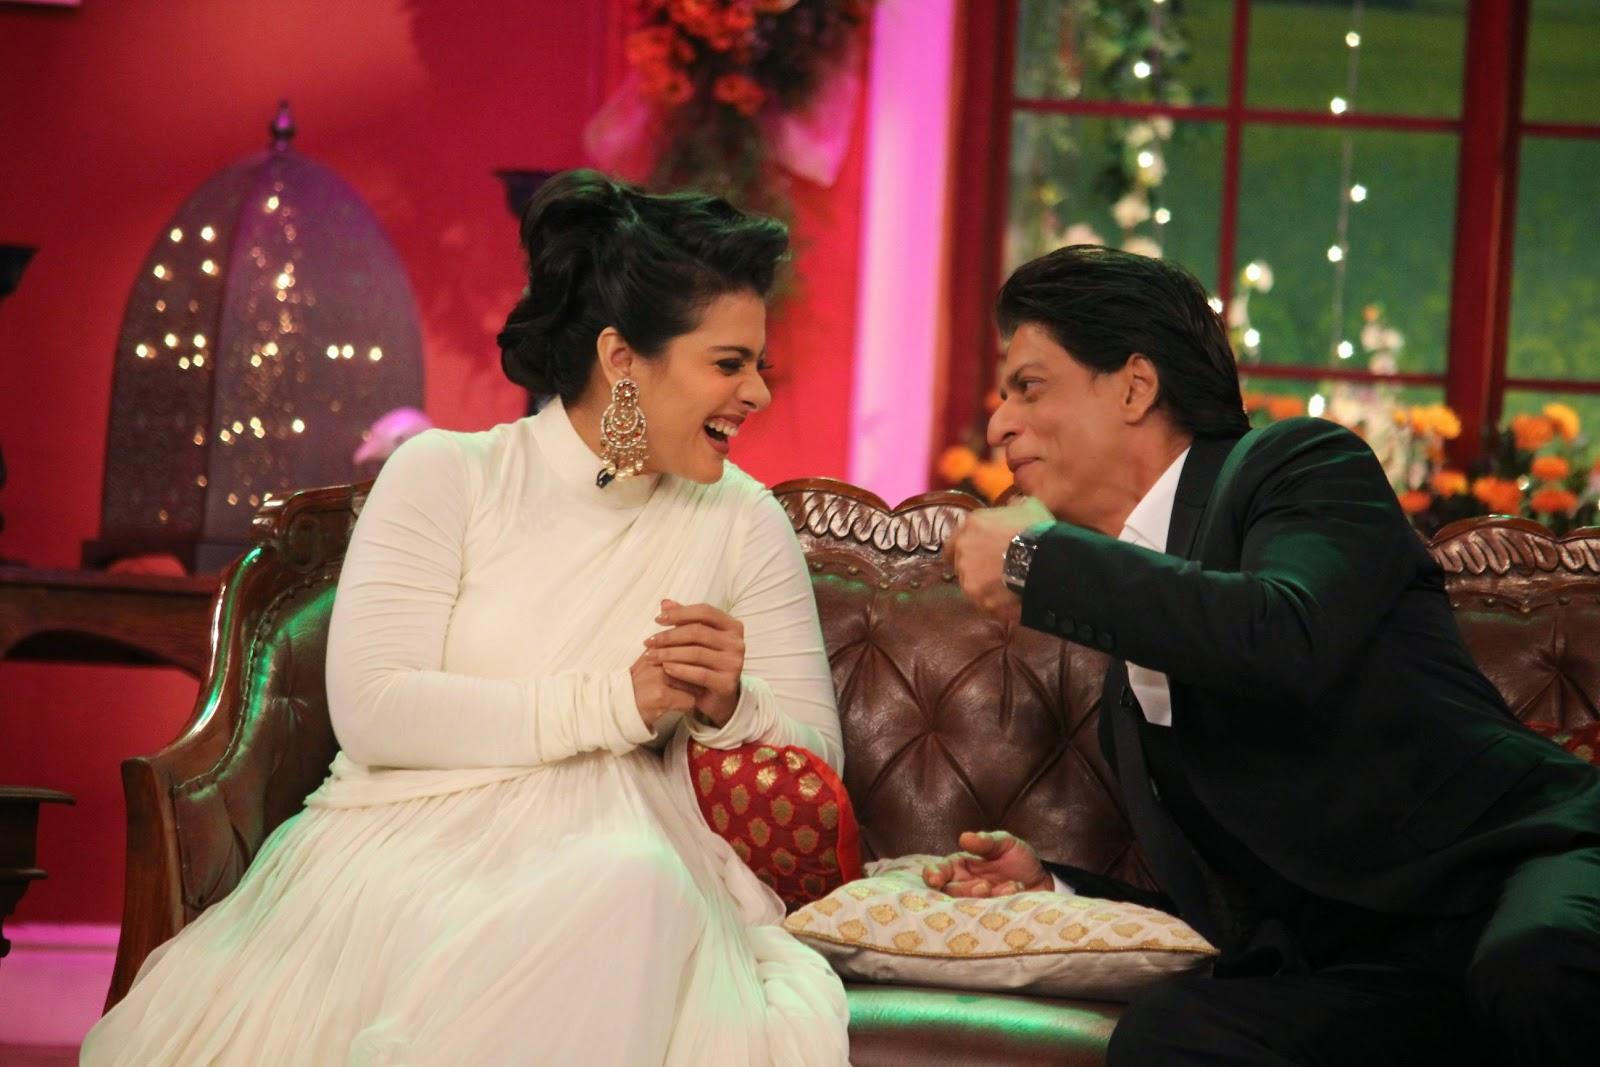 Shah Rukh Khan Stills At Comedy Nights With Kapil Sets, Shah Rukh Khan-Kajol DDLJ Team on CNWK